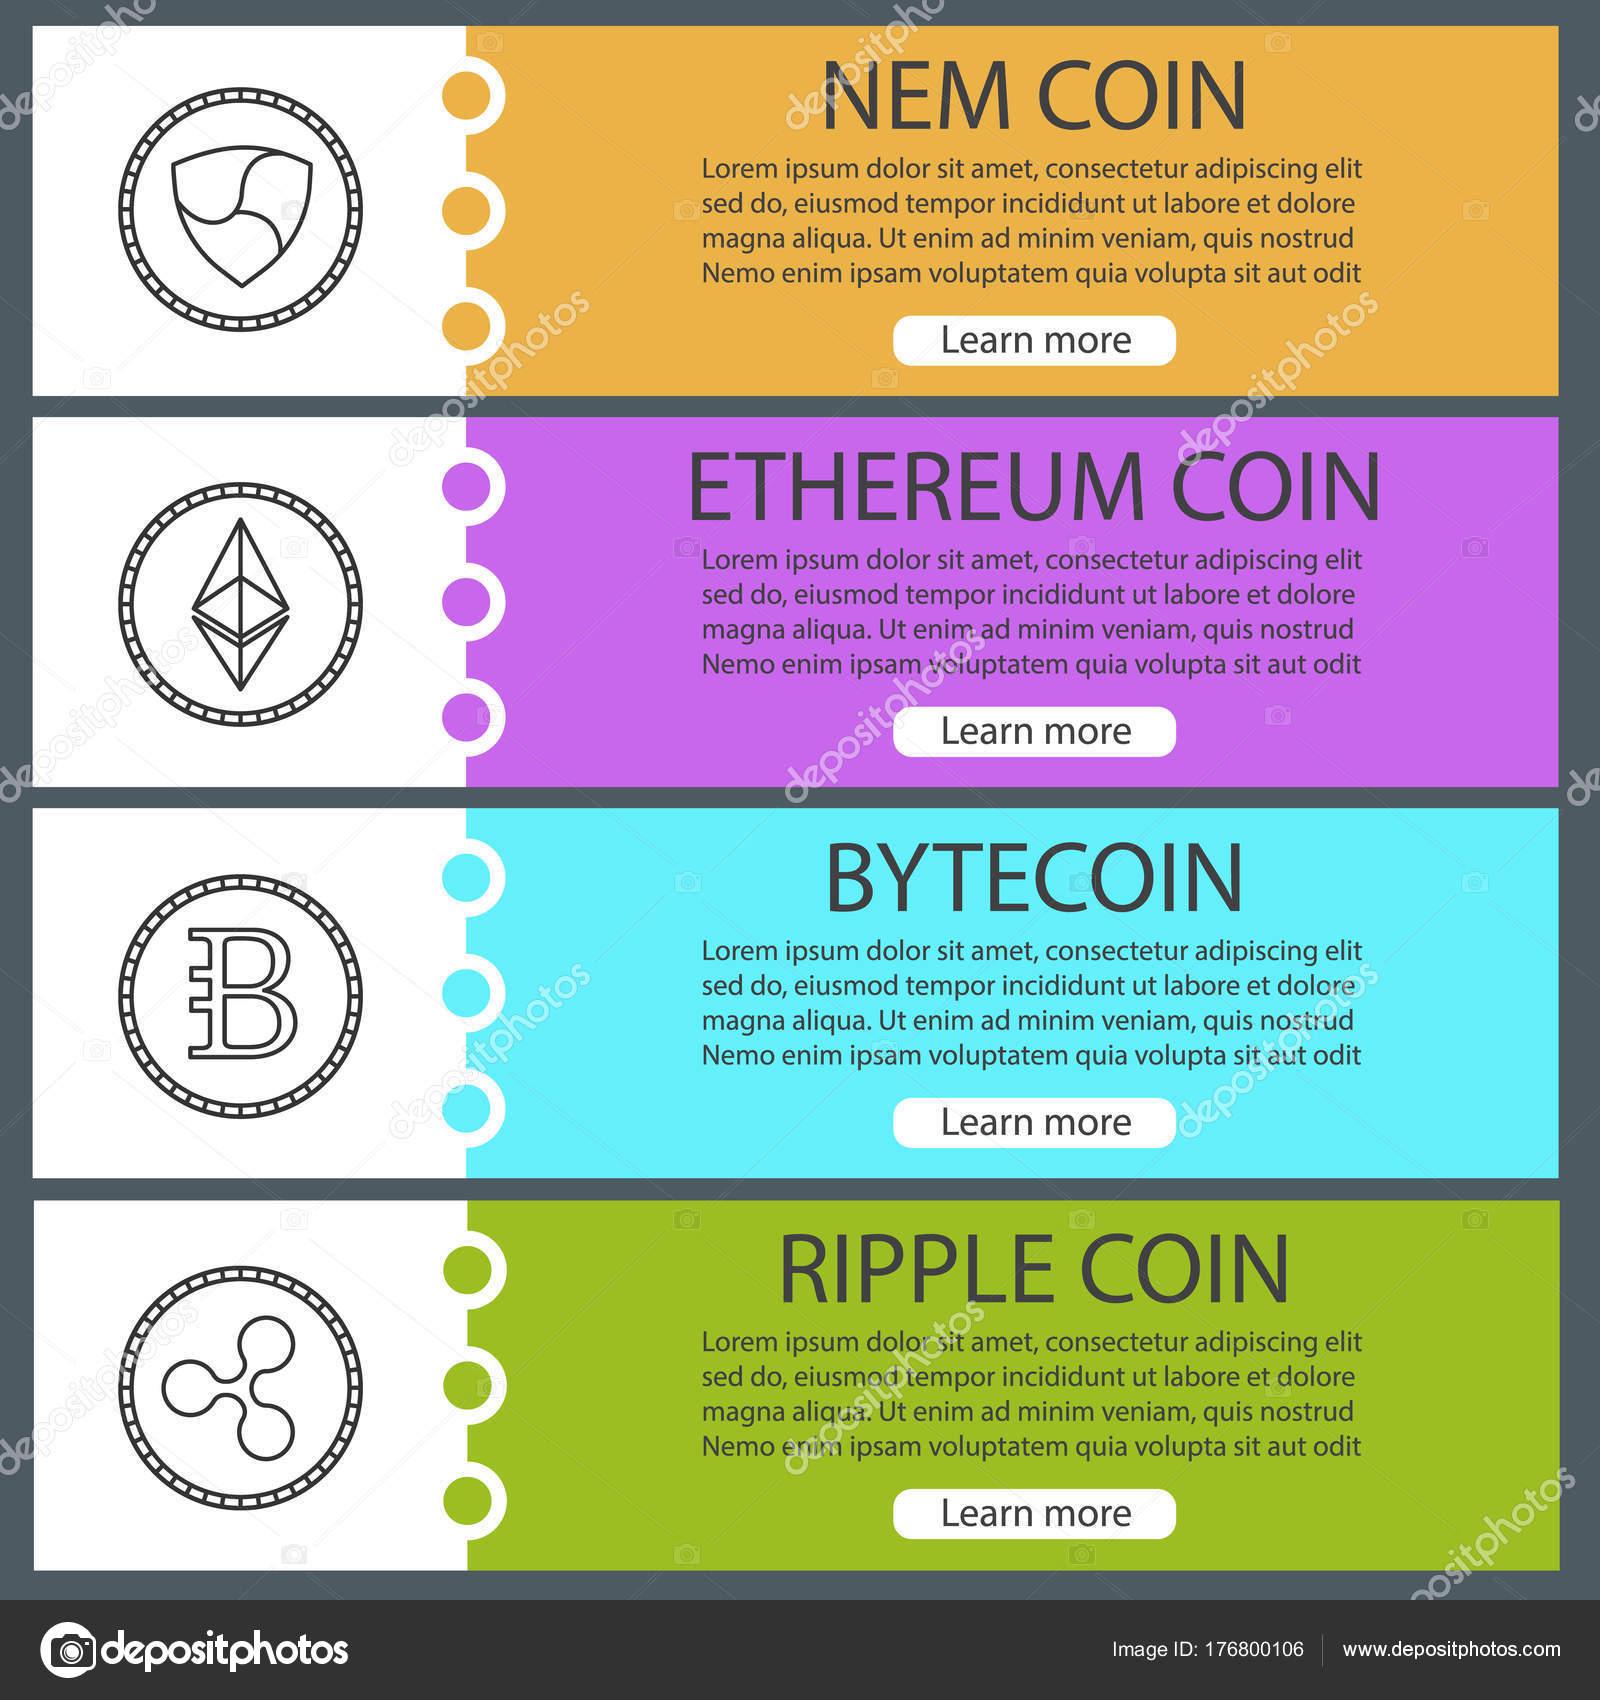 ethereum coin website